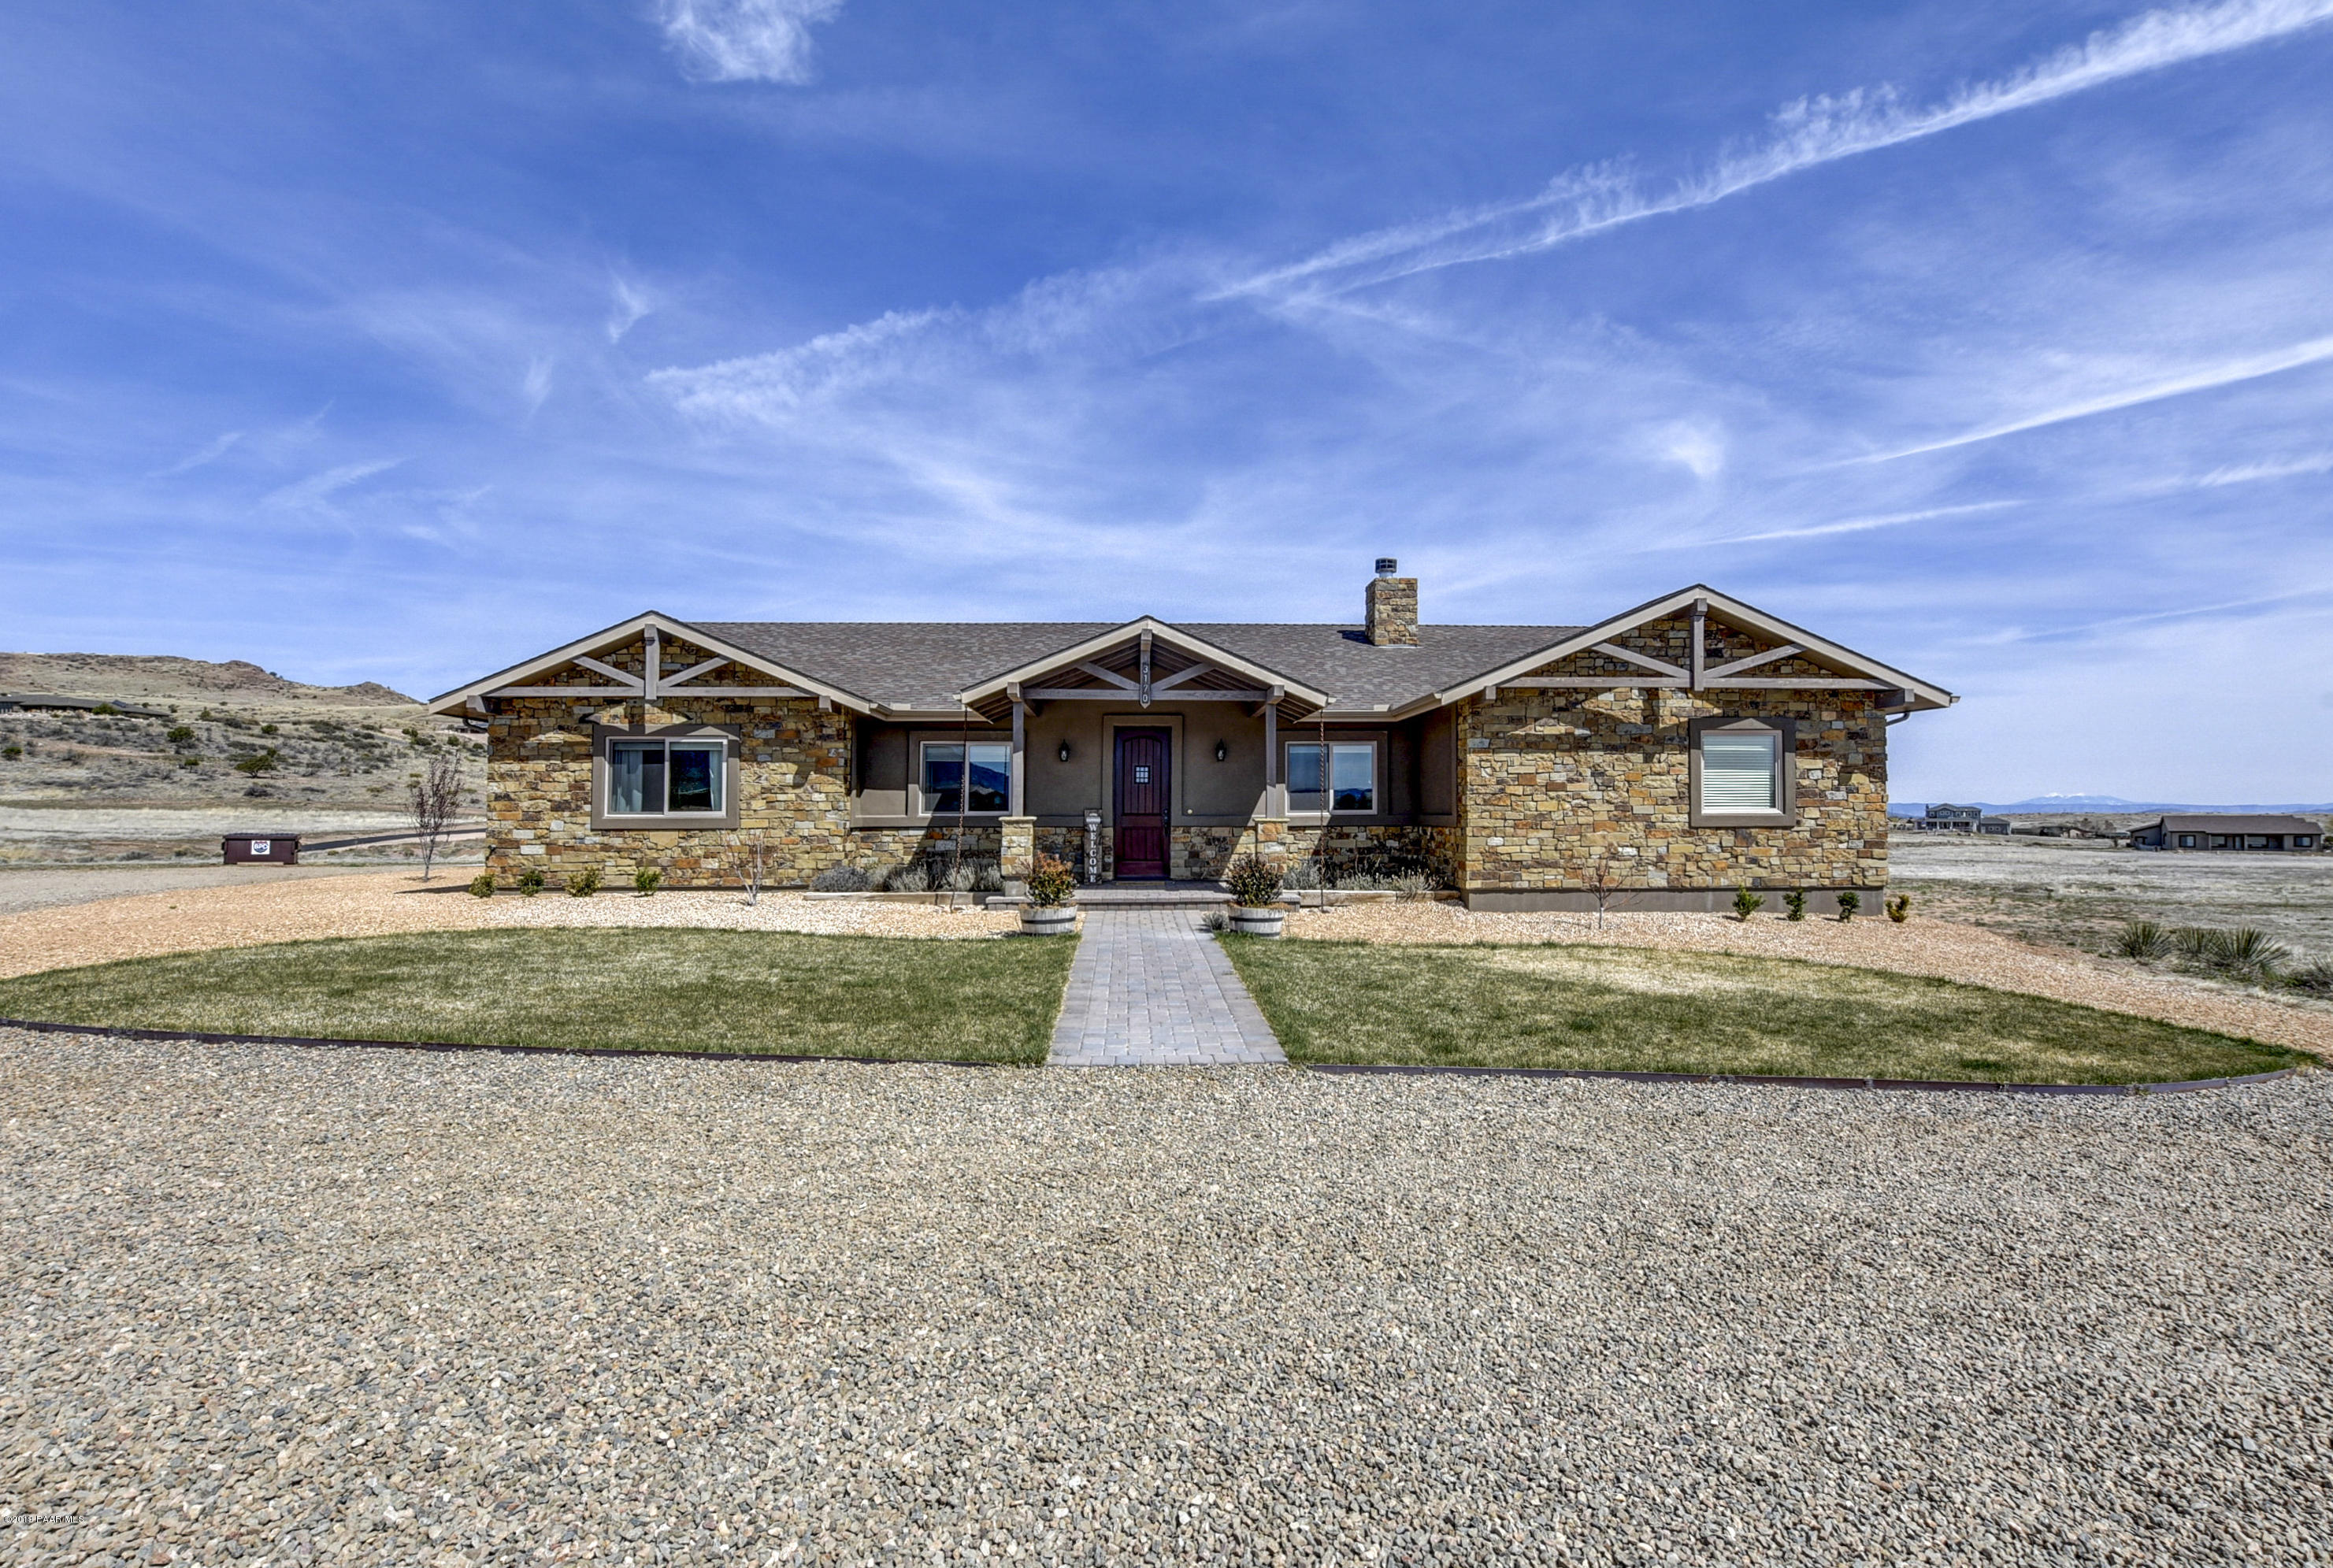 3170 W L Bar L Road, Prescott in Yavapai County, AZ 86305 Home for Sale